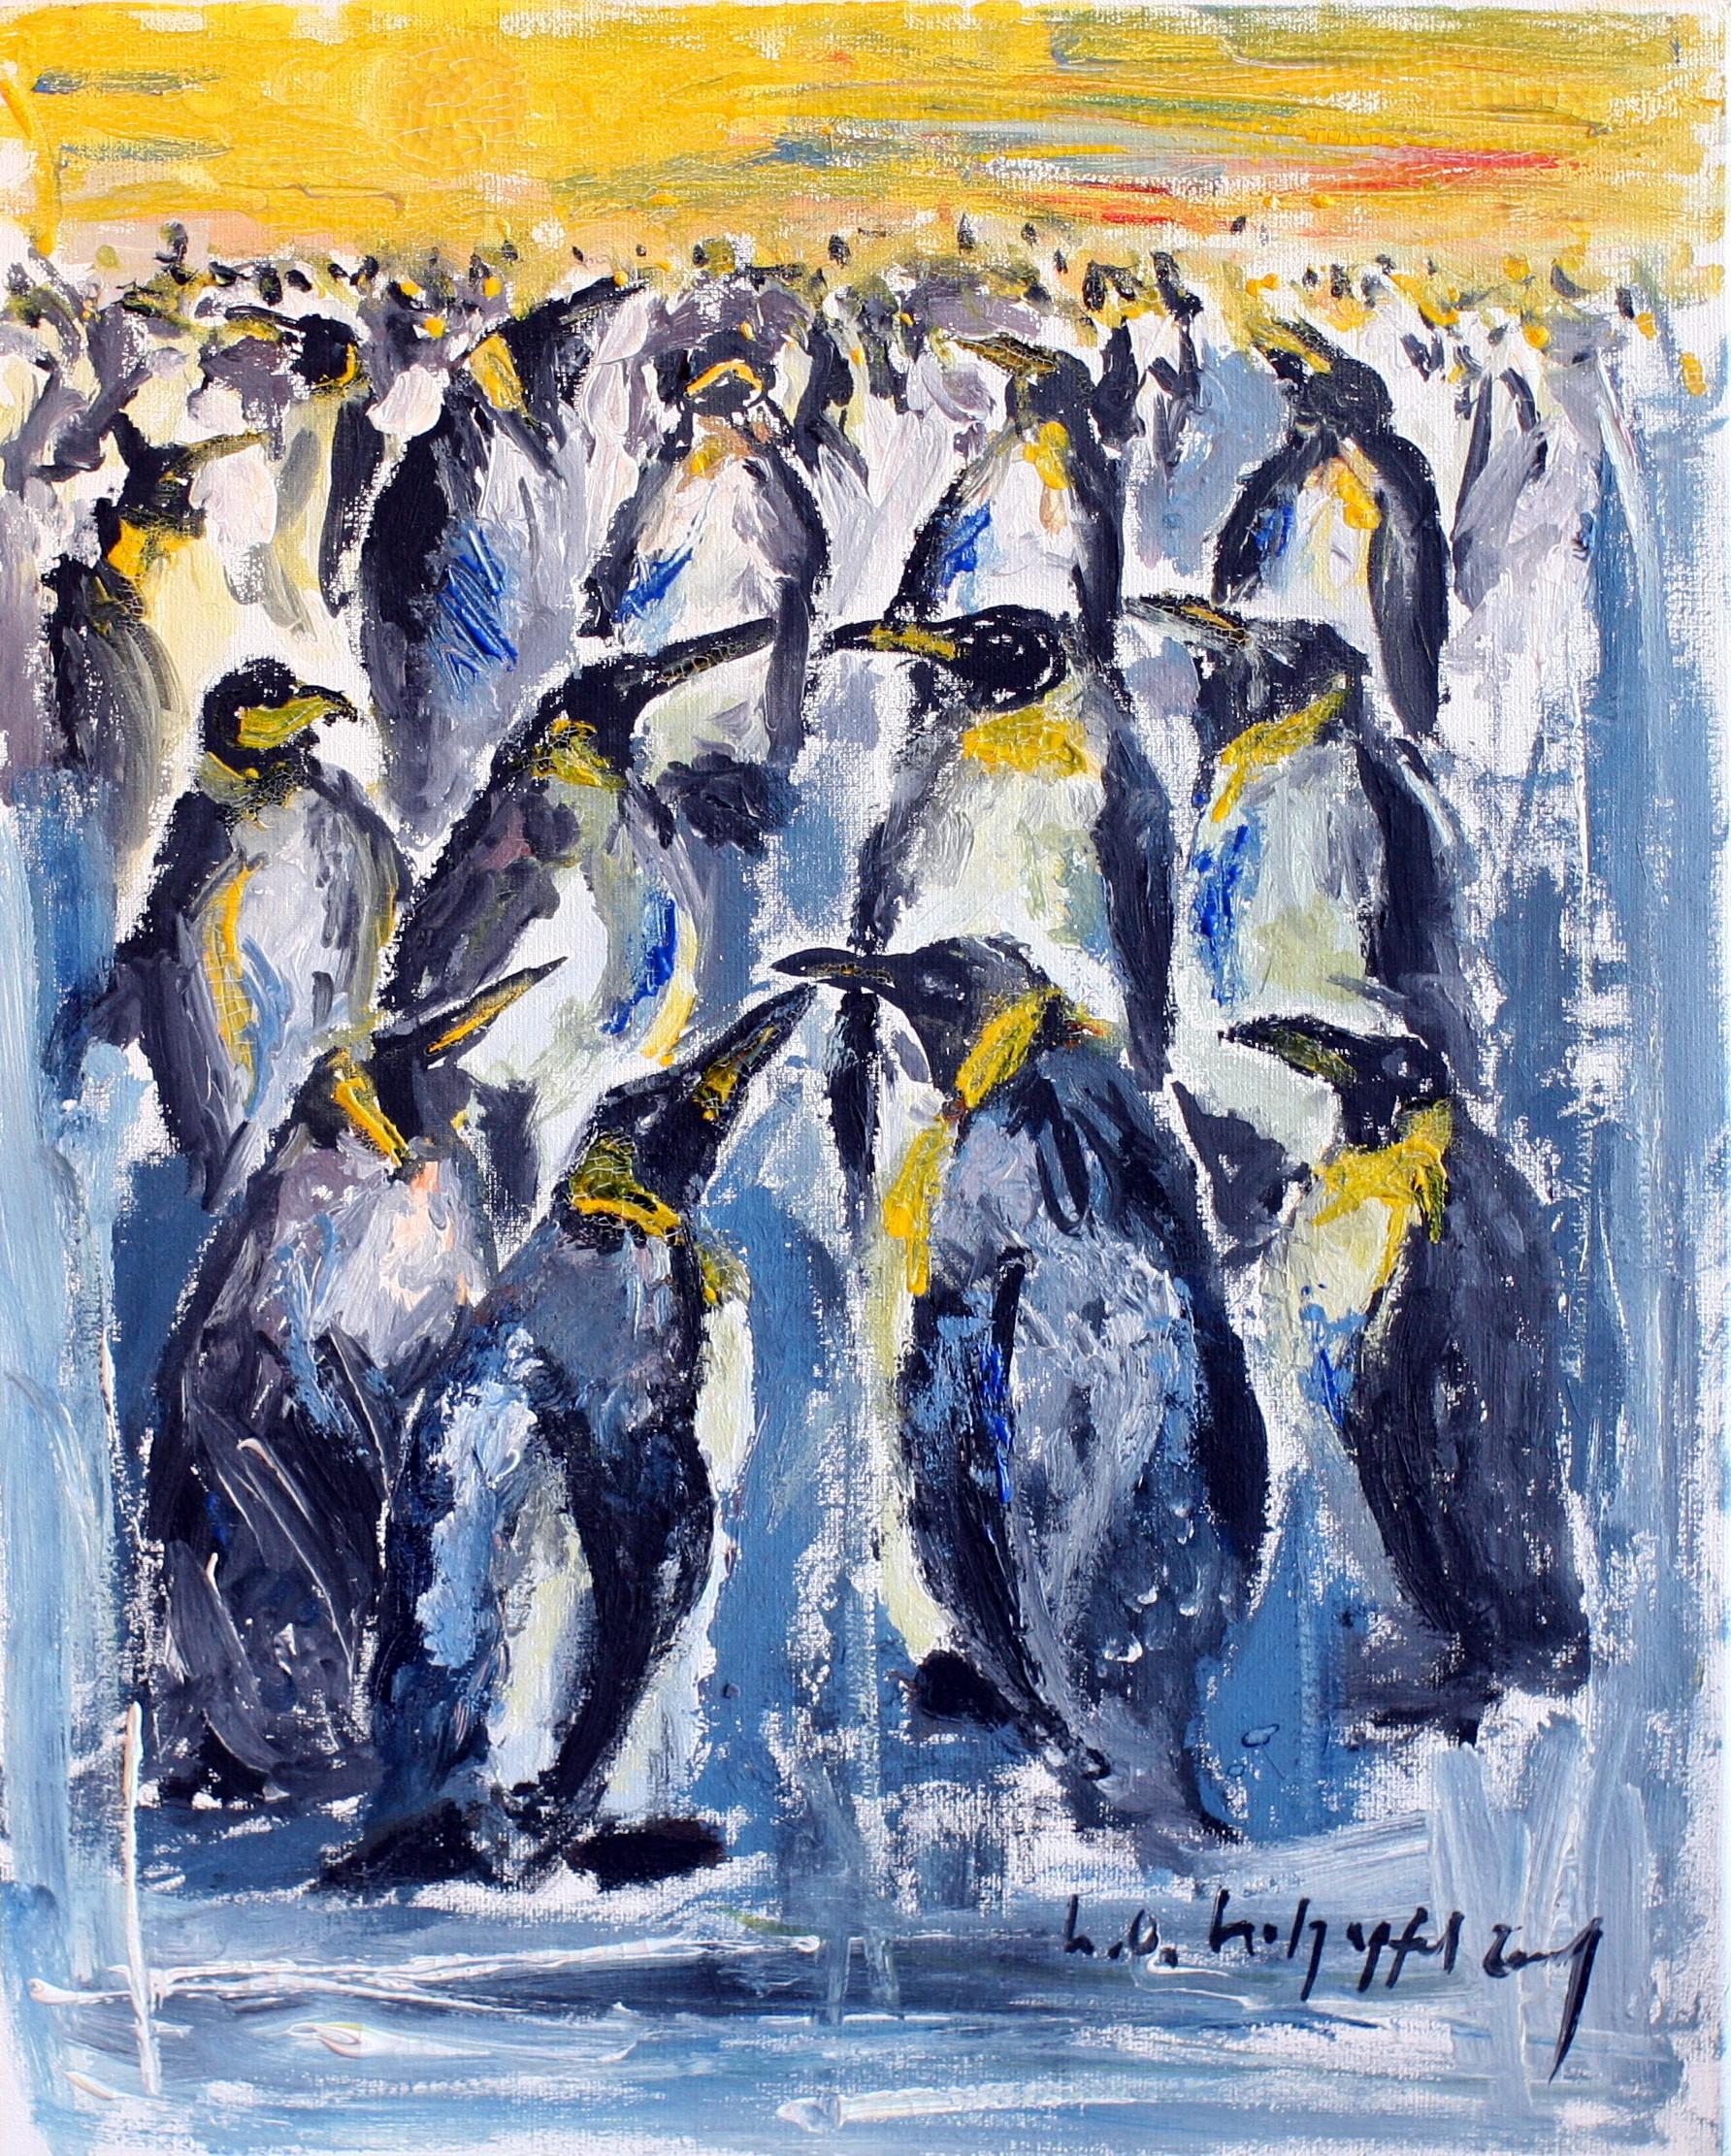 Konferenz der Pinguine